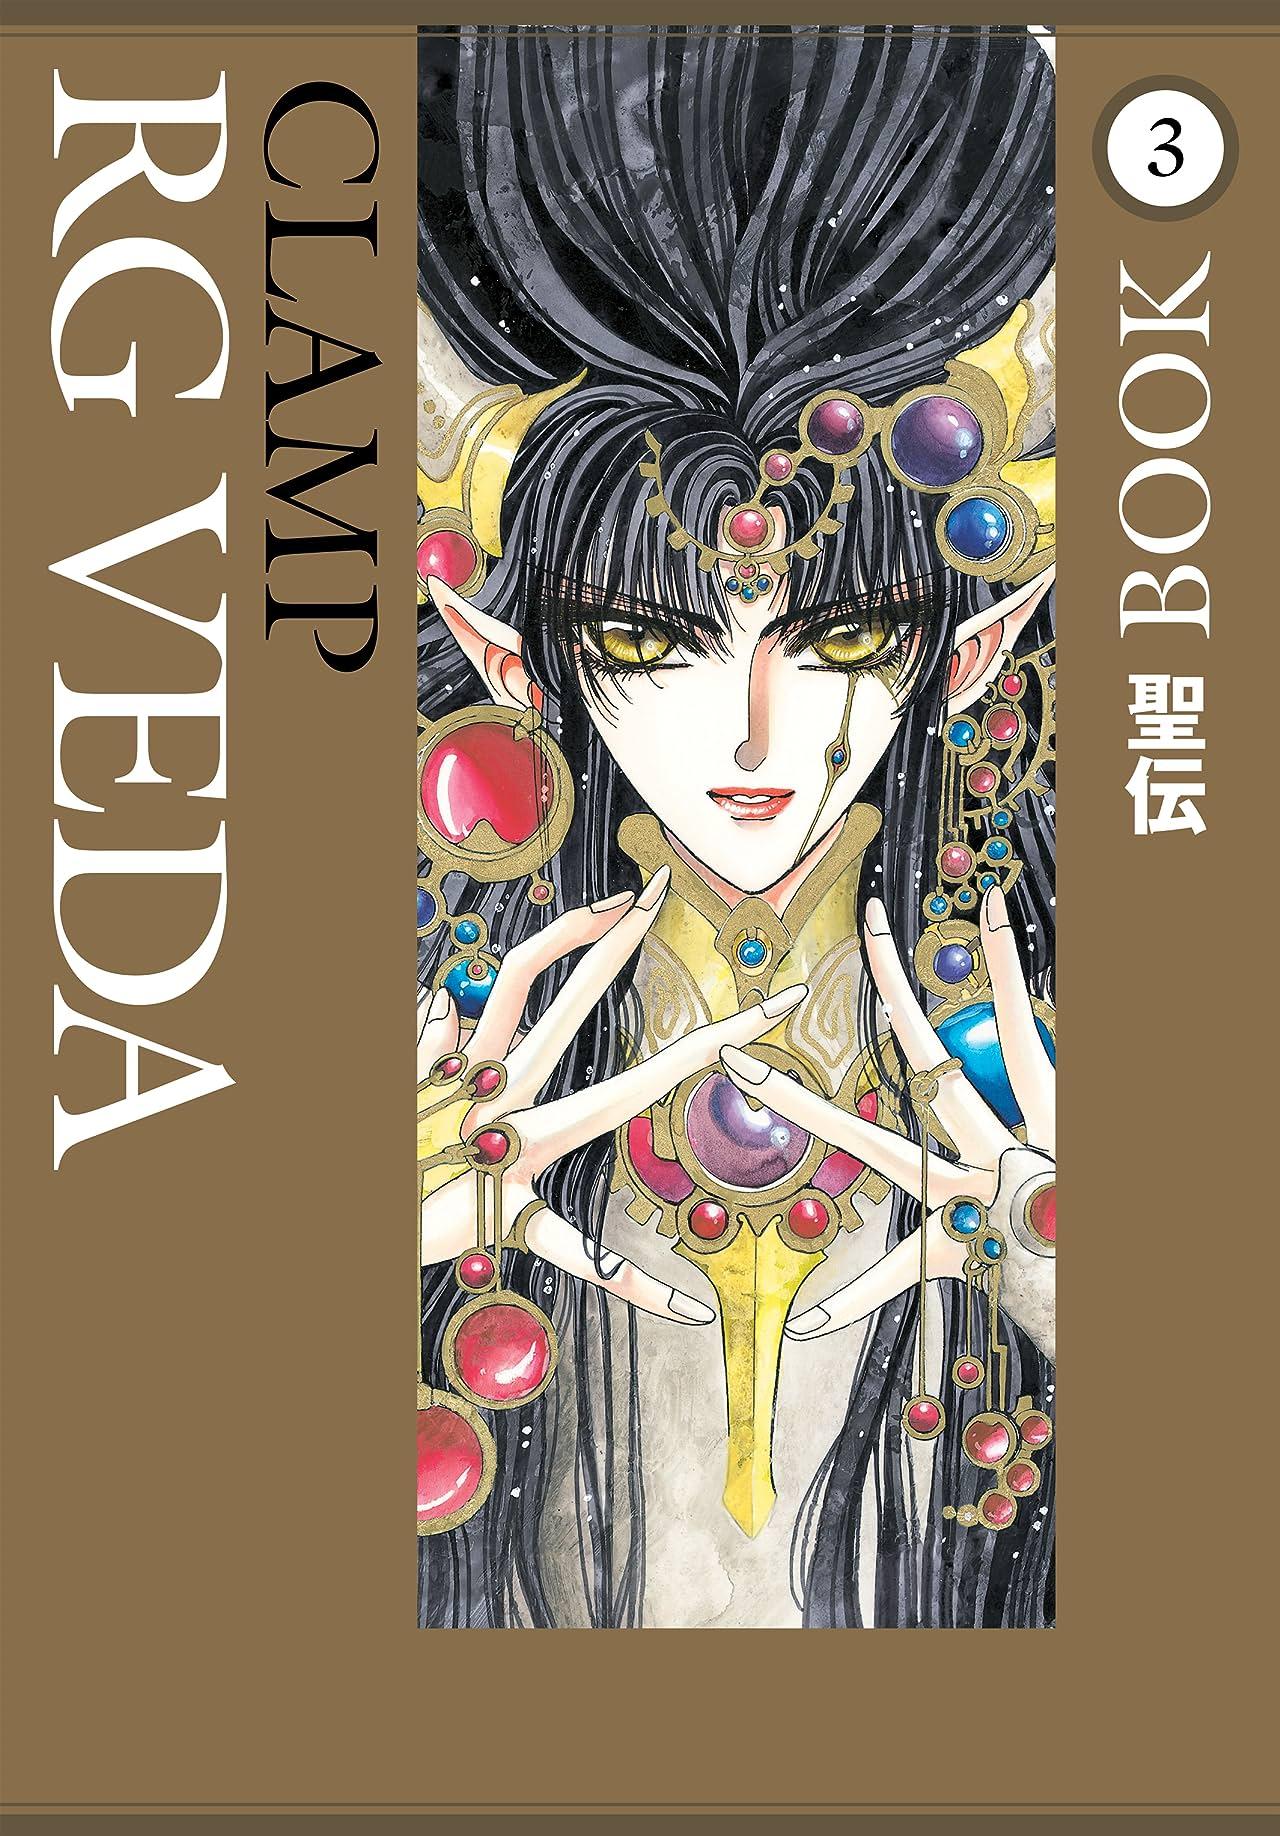 RG Veda Omnibus Vol. 3